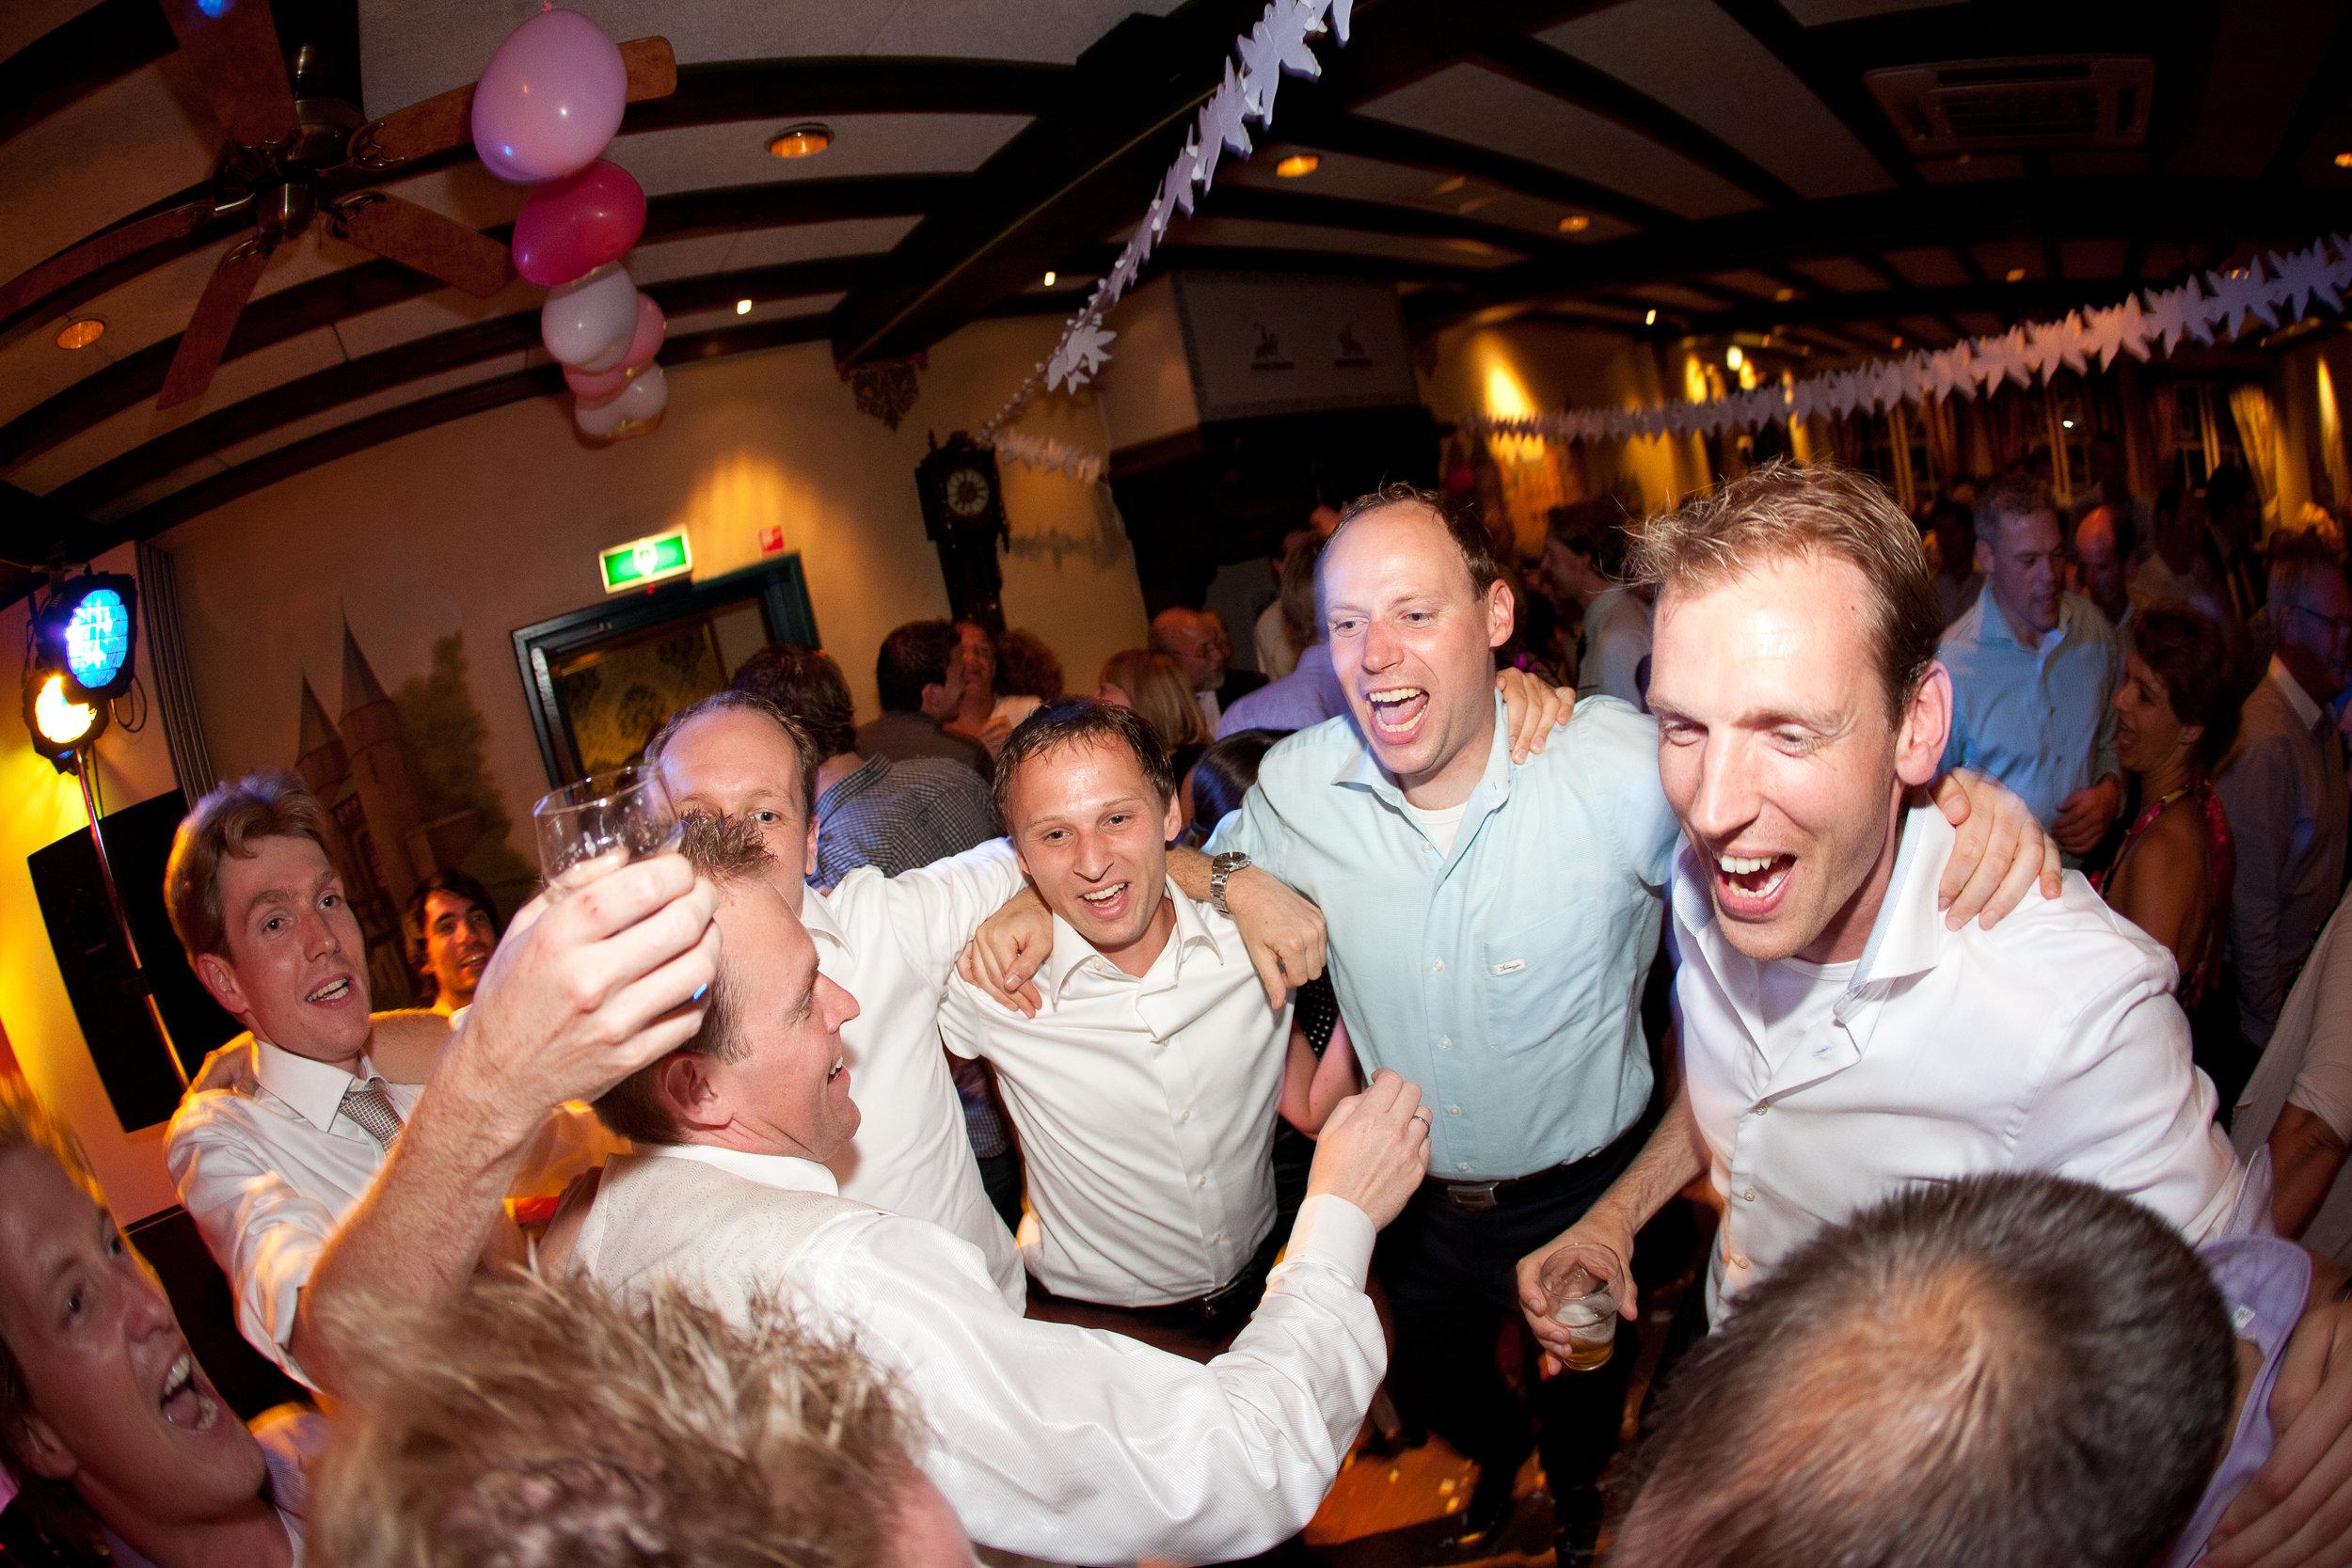 trouwshoot-bruidsfotografie-trouwfoto-feestfotografie-trouwreportage-Jan en Loes596.jpg